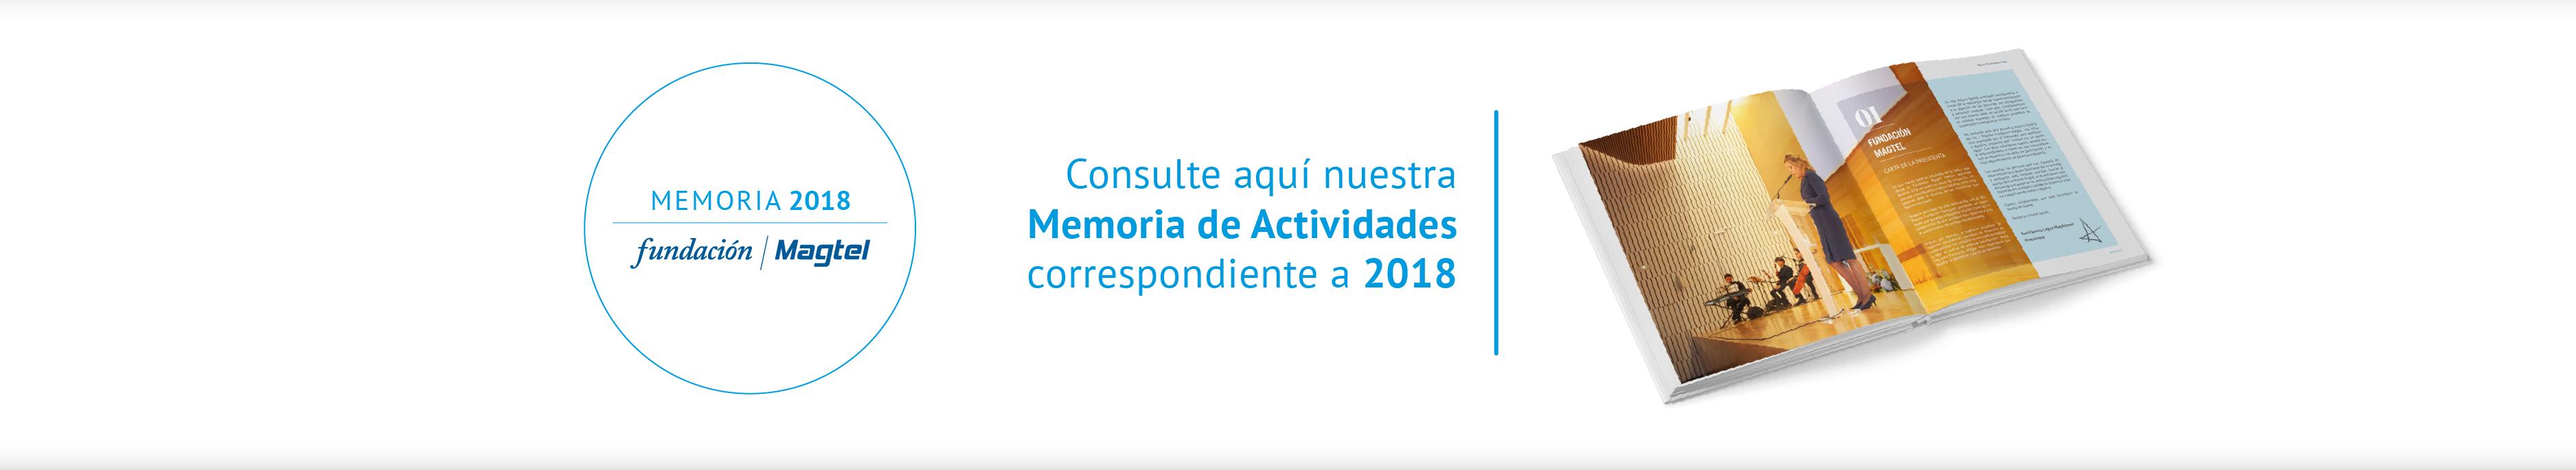 Memoria-2018-Fundacion-Magtel-banner